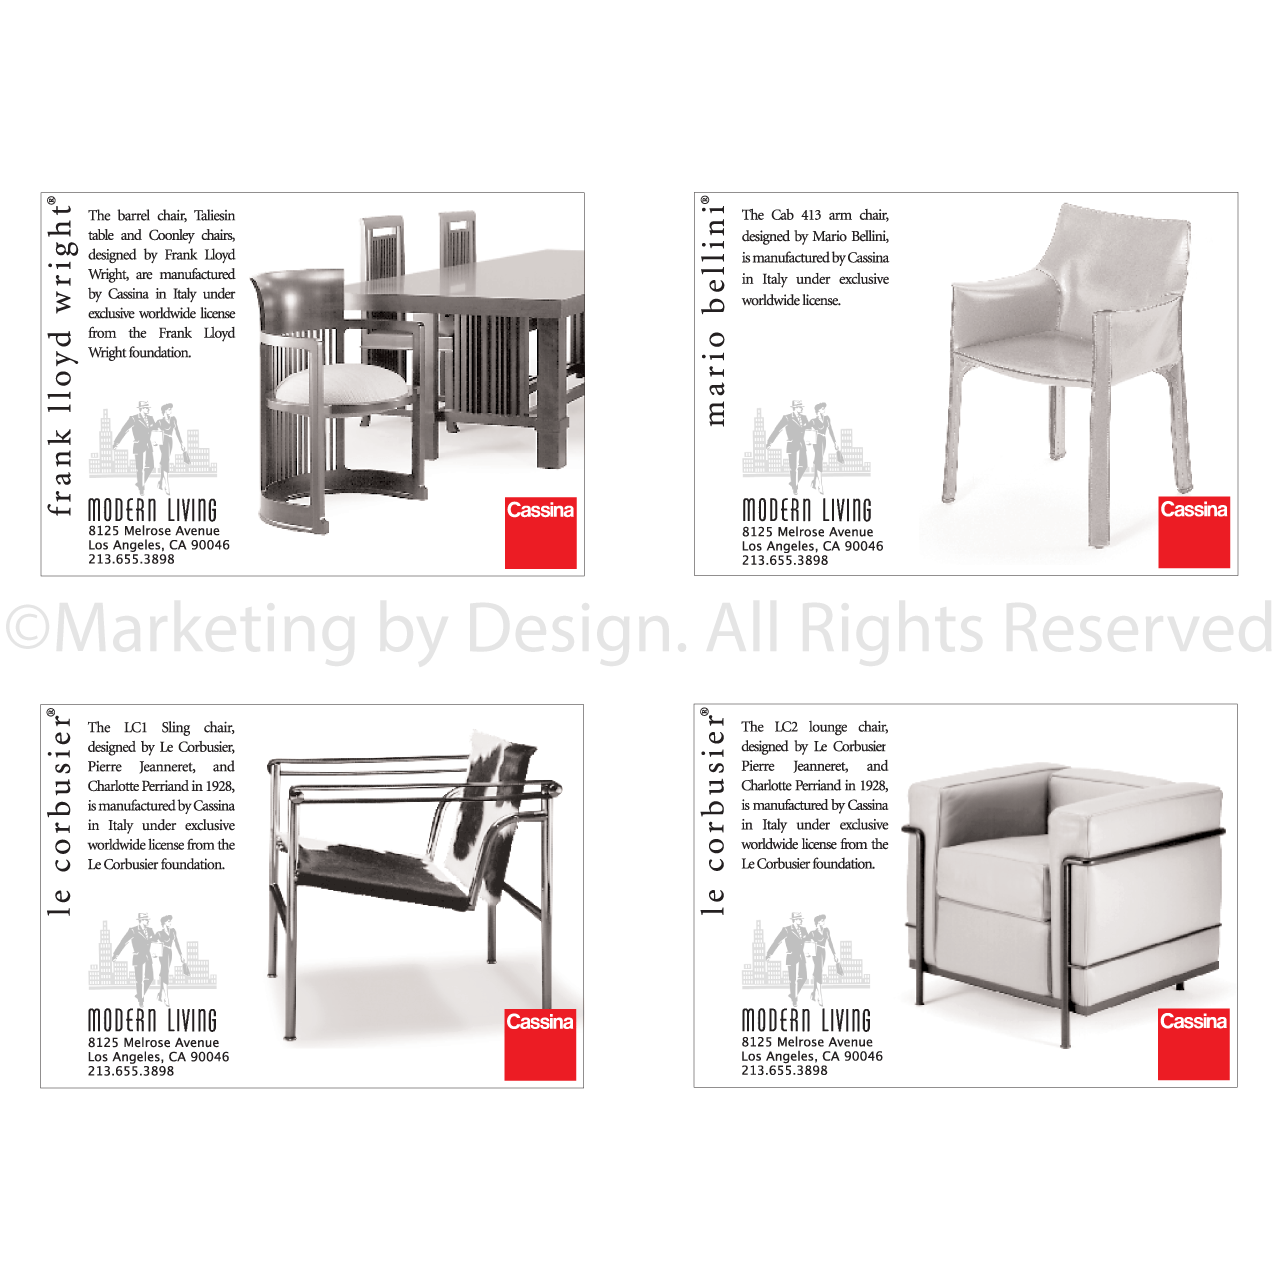 Marketing by Design | Portfolio: Modern Living Ads